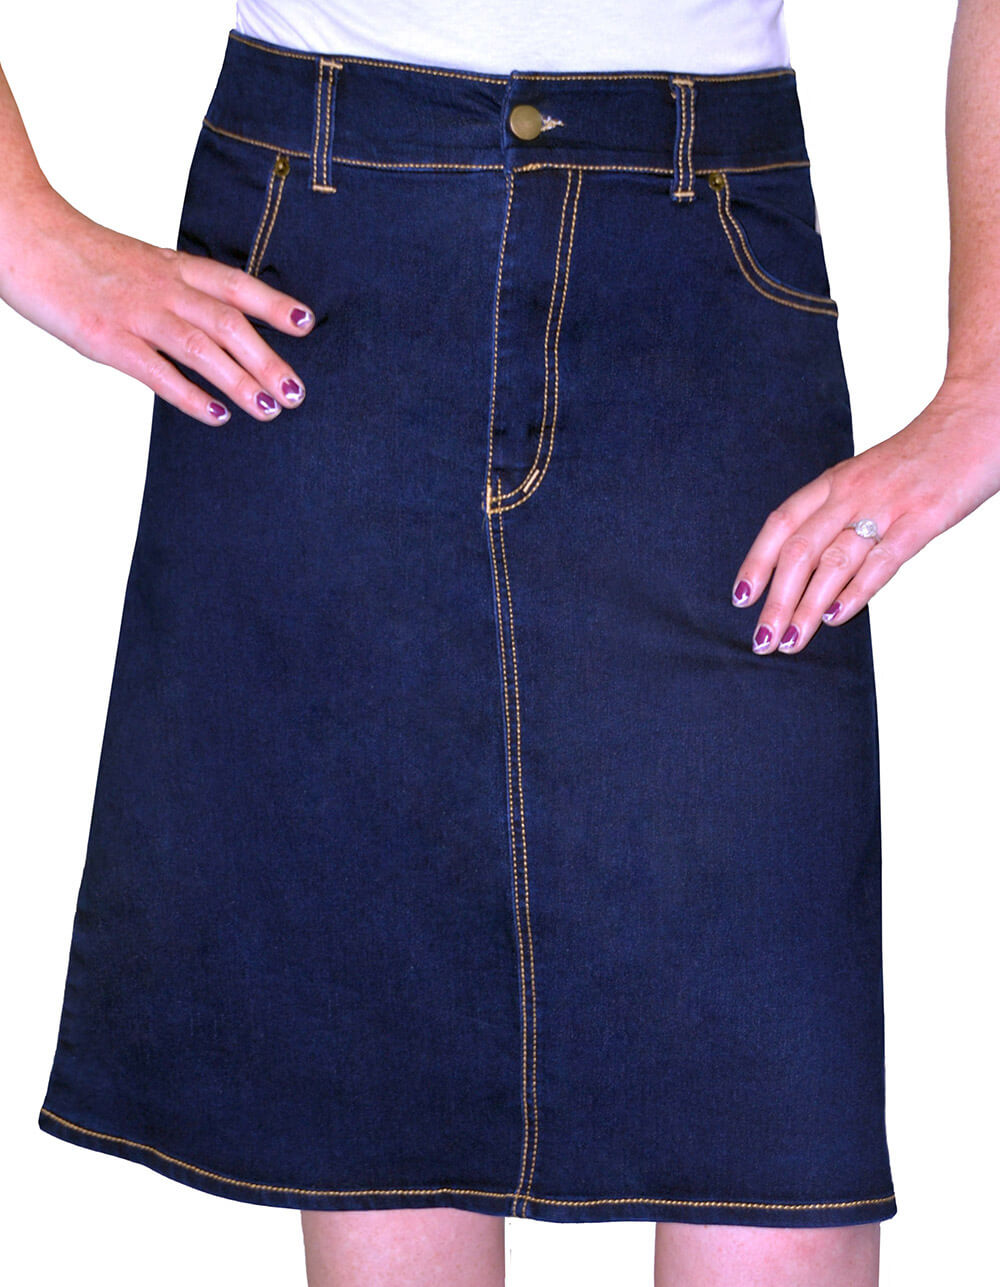 knee length a line denim skirt for kosher casual